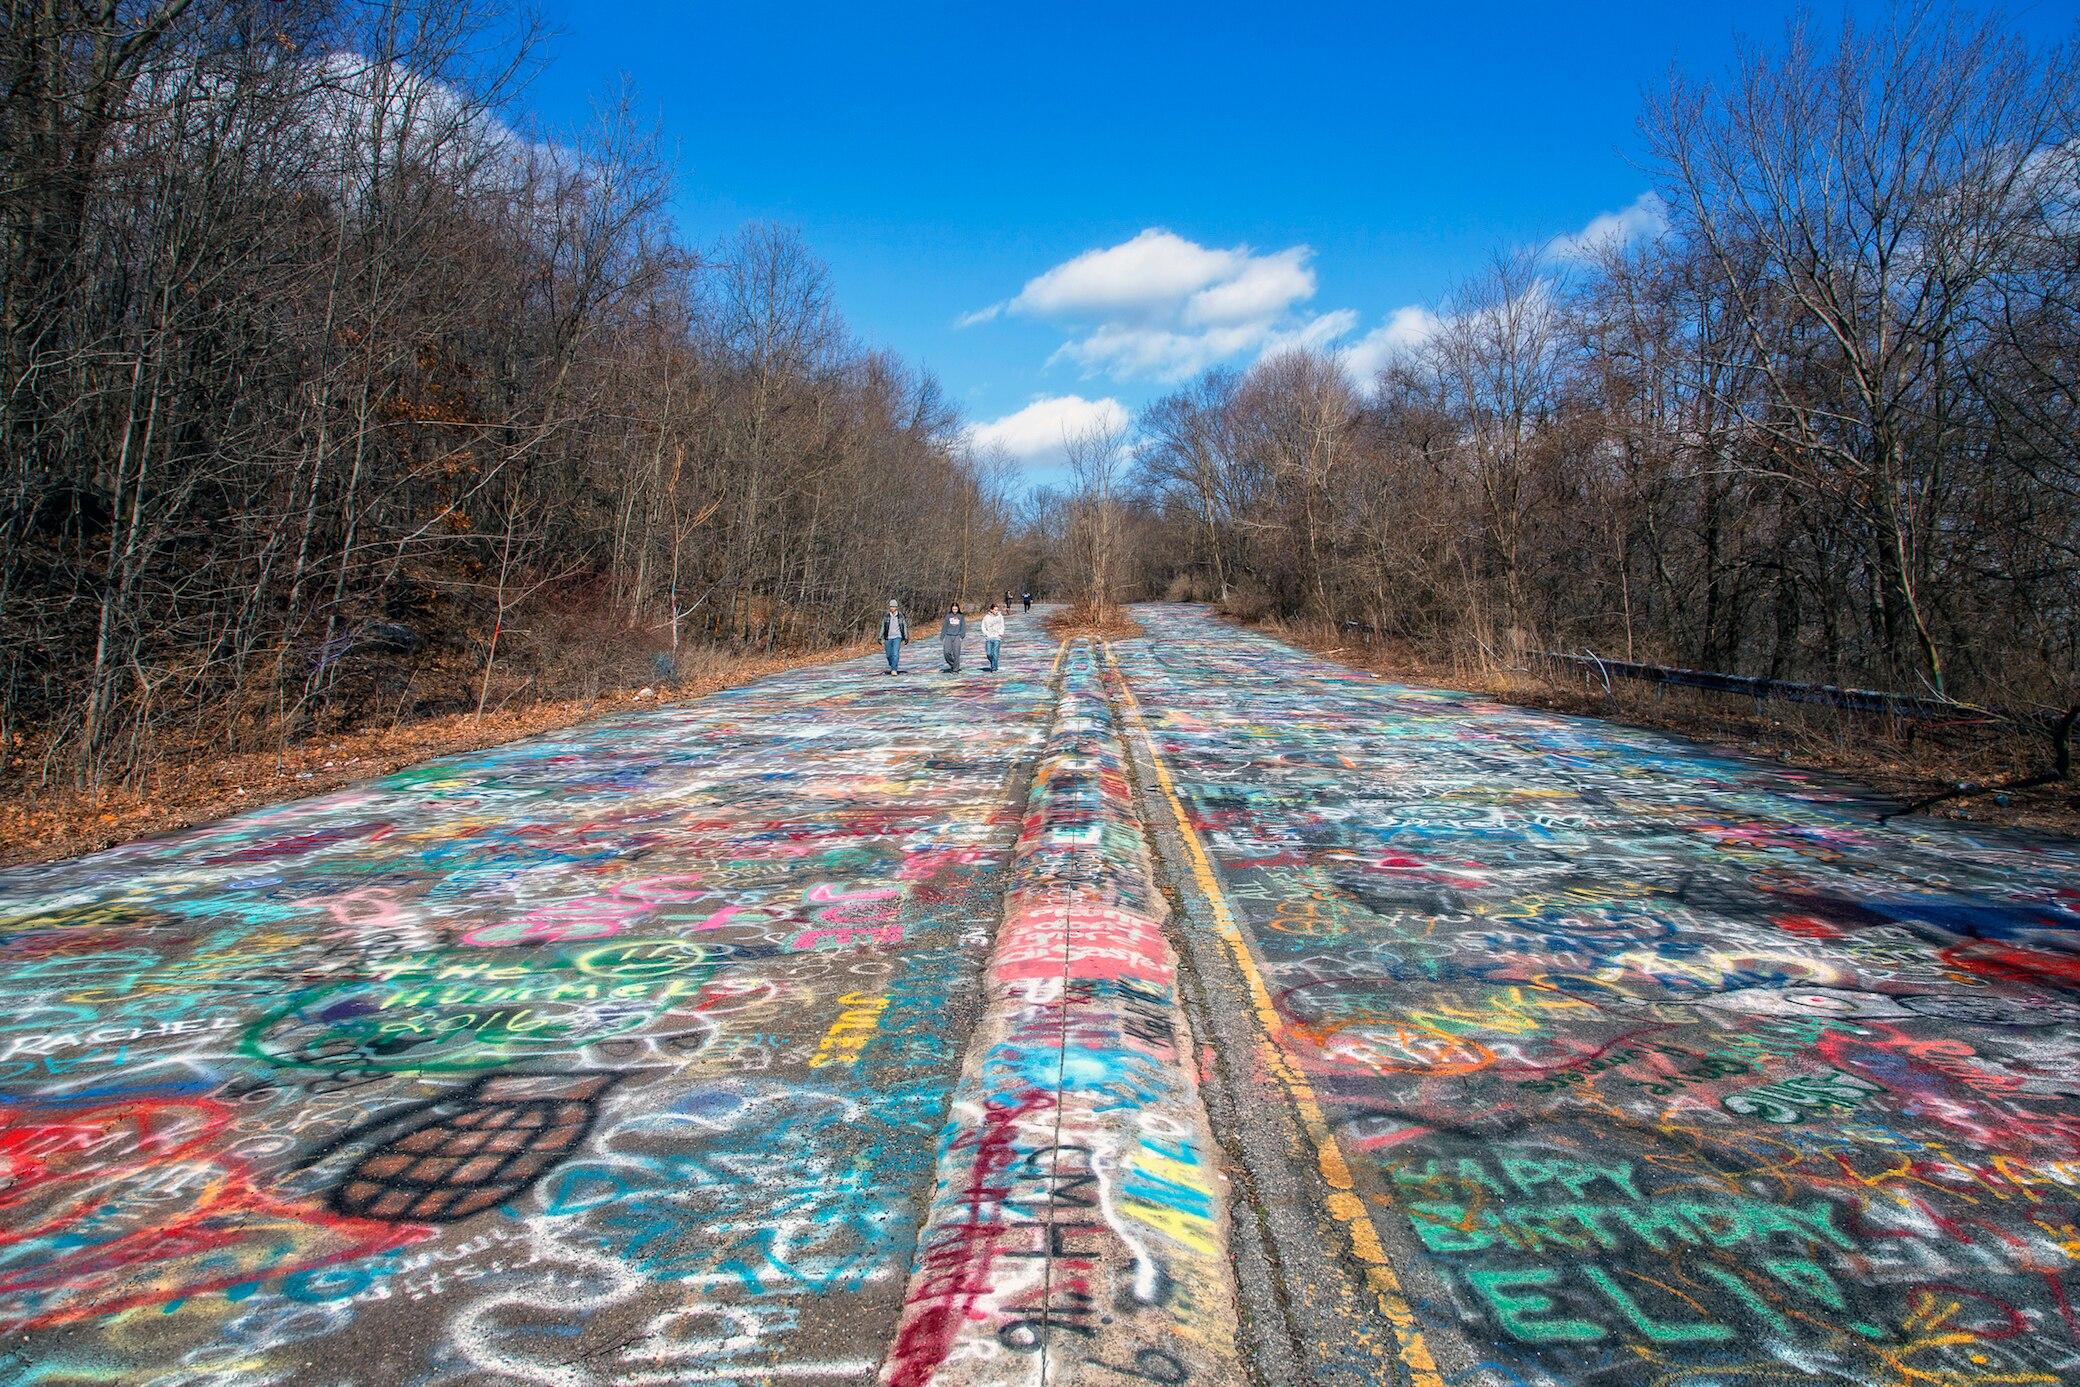 Der Graffiti Highway, die Route 61, in Pennsylvania, USA